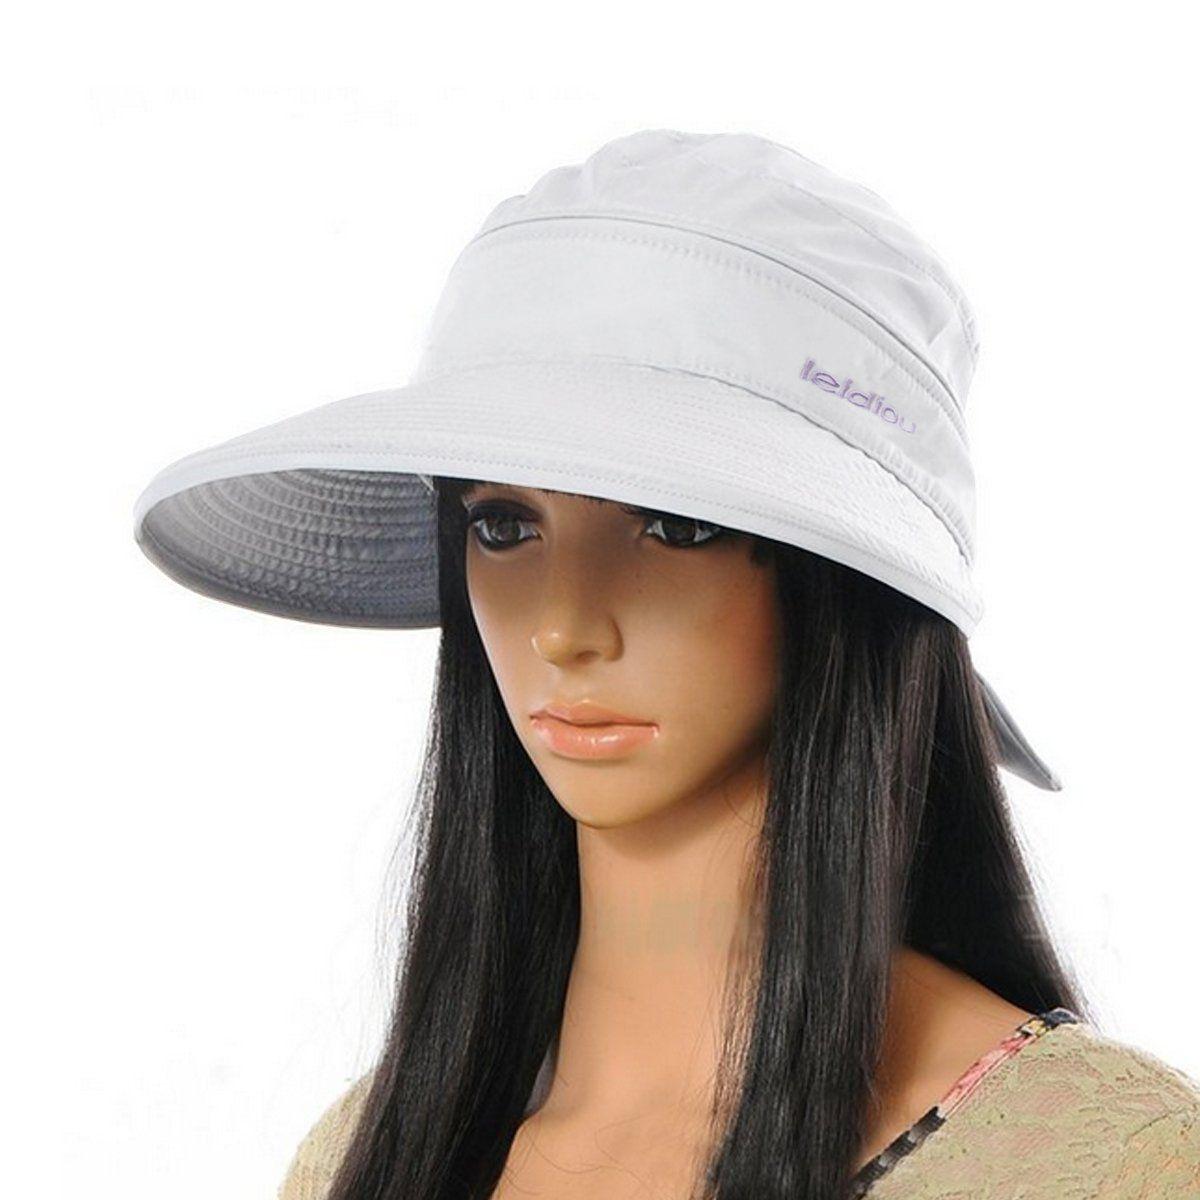 d1eba6dcb6dff Aisa Women Bowknot Sun Hat Wide Large Brim Visor Hat Cap Summer Beach Hat  Color White. 100% Polyester. Estimated Head  Circumference 20